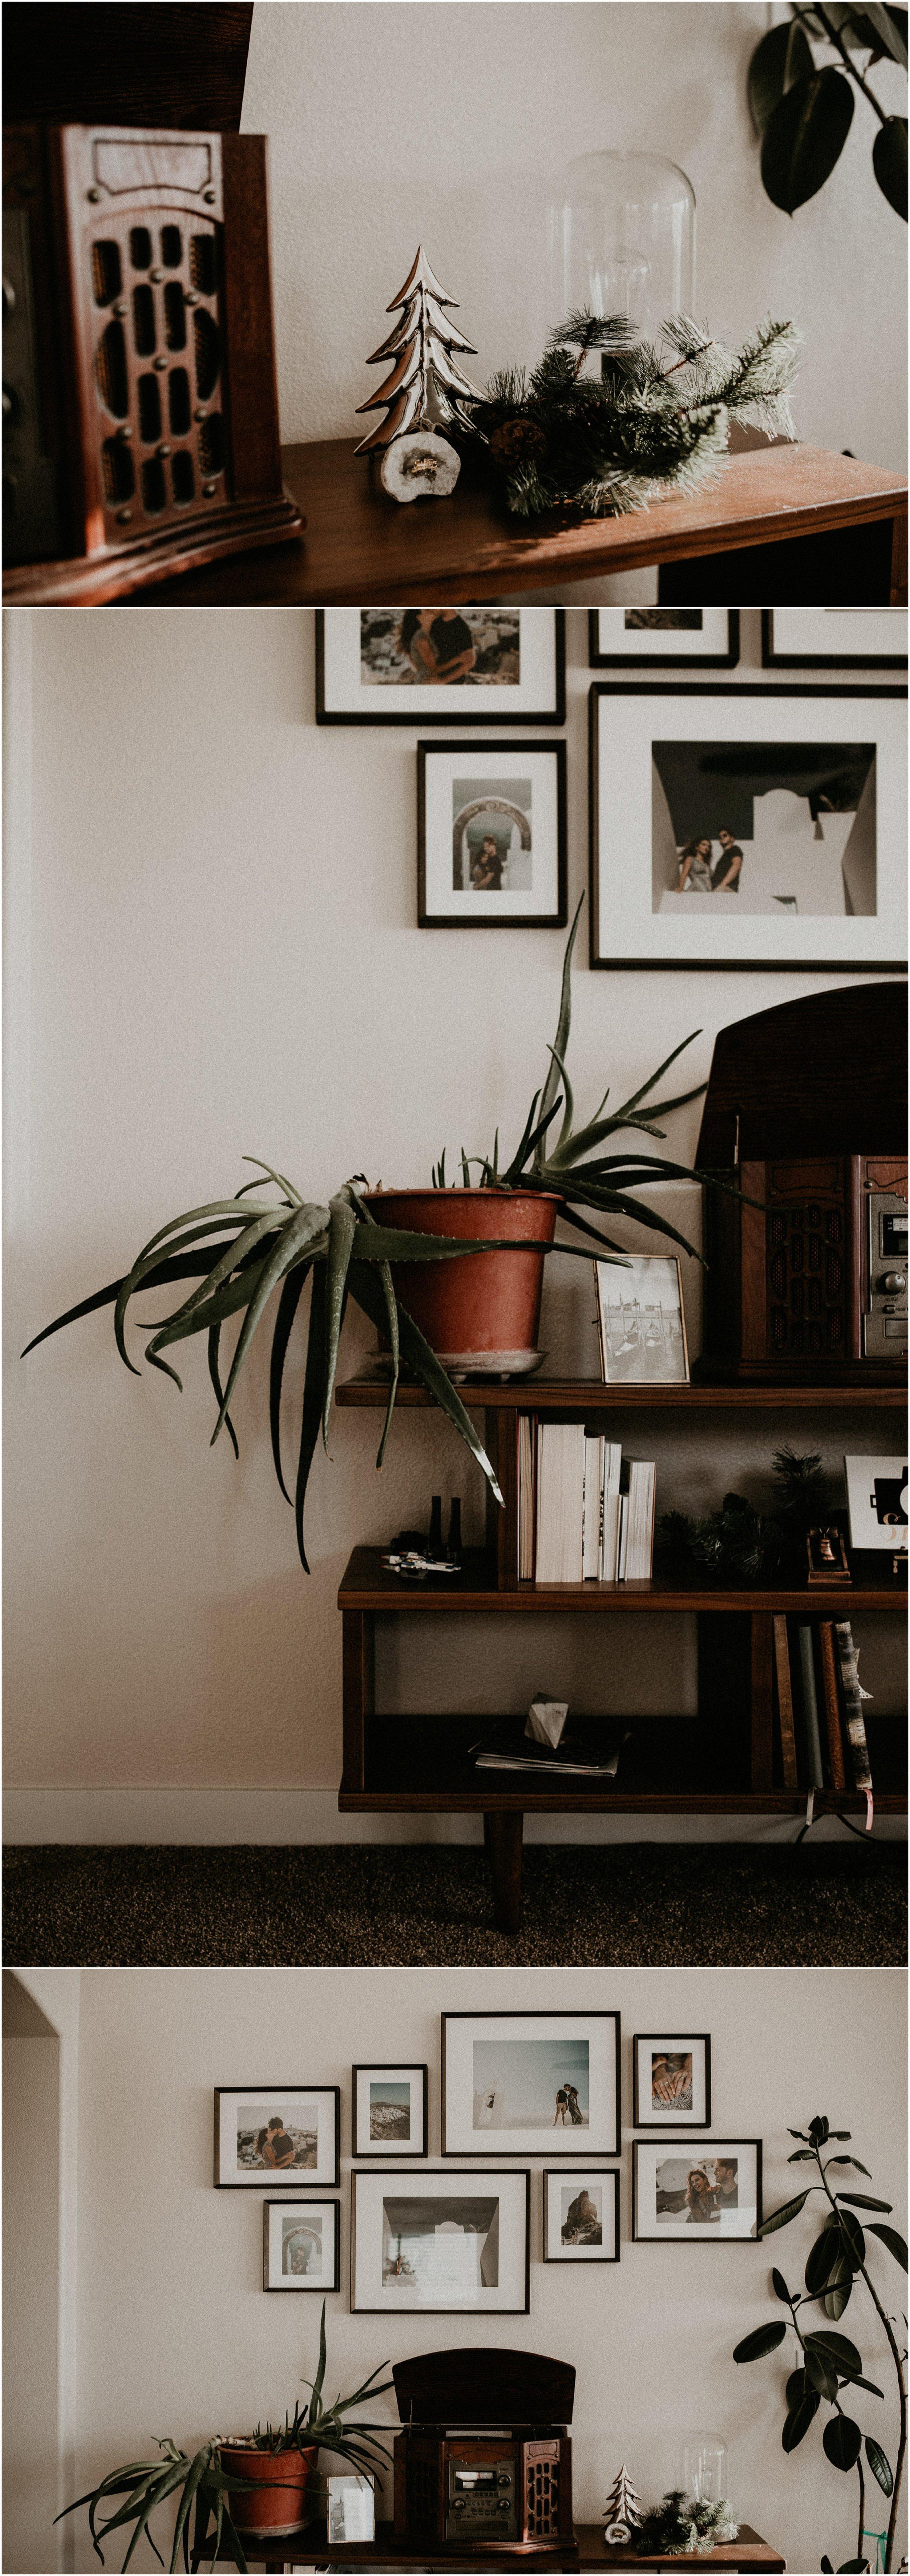 Boise Boudoir Photographer Boise Senior Photographer Makayla Madden Photography Mid Century Modern Ashlyn Bookshelf World Market Aloe Plant Record Player Vinyl